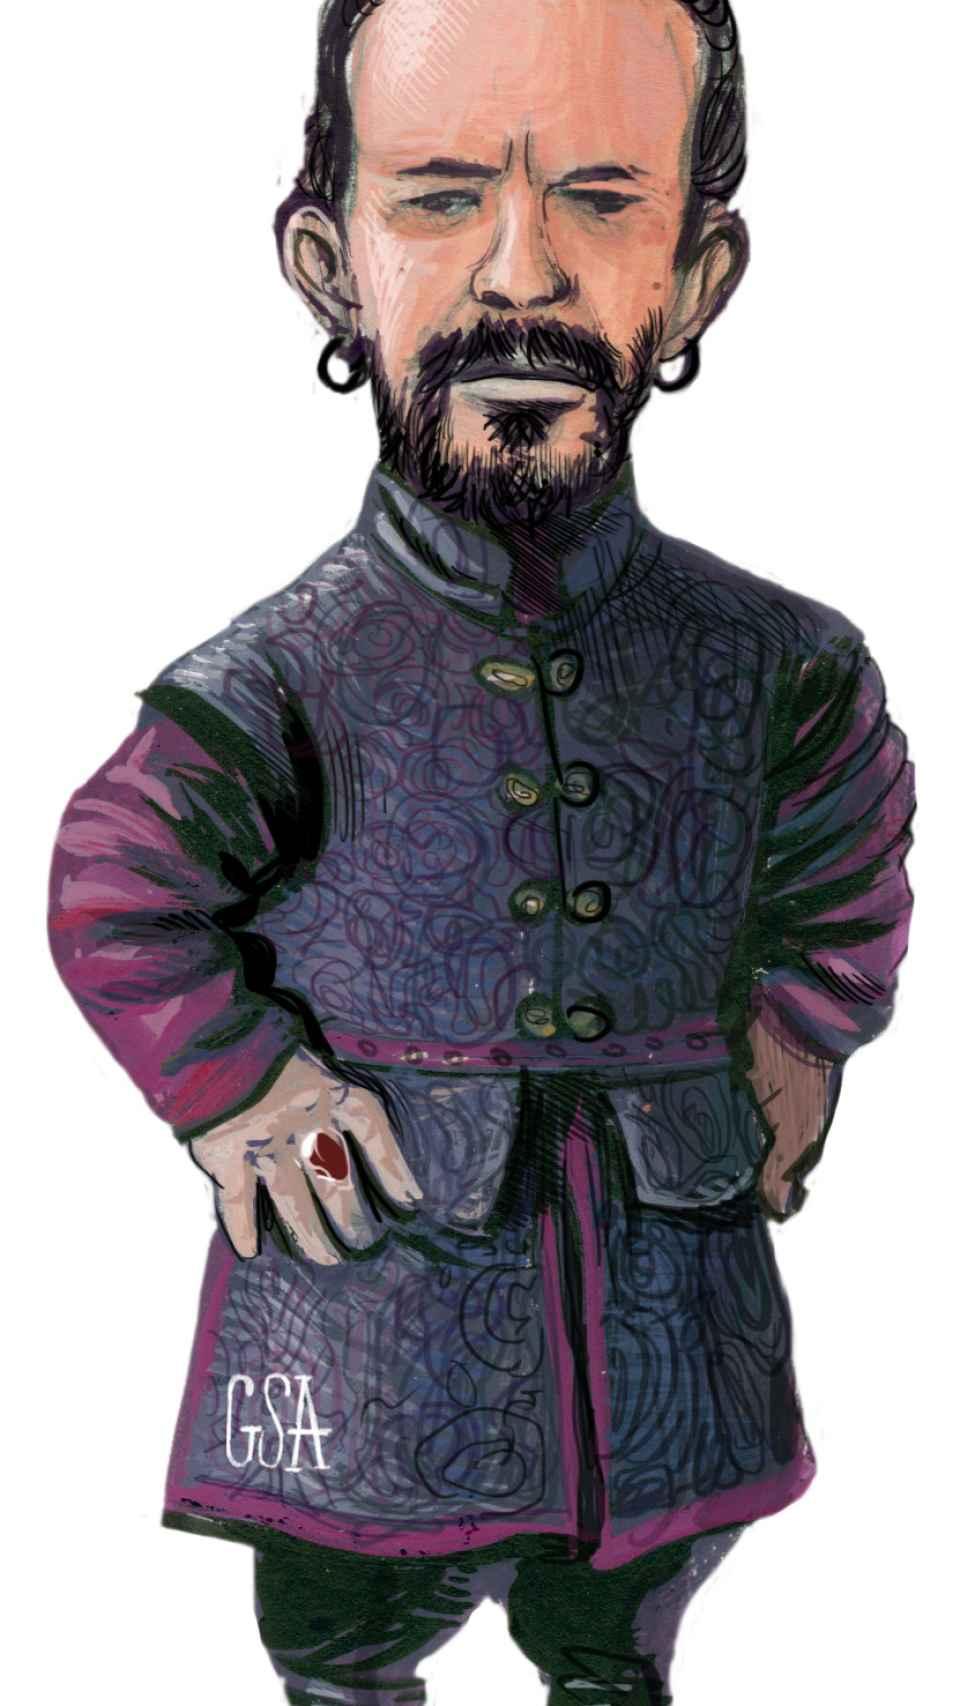 Pablo Iglesias como Tyrion Lannister.